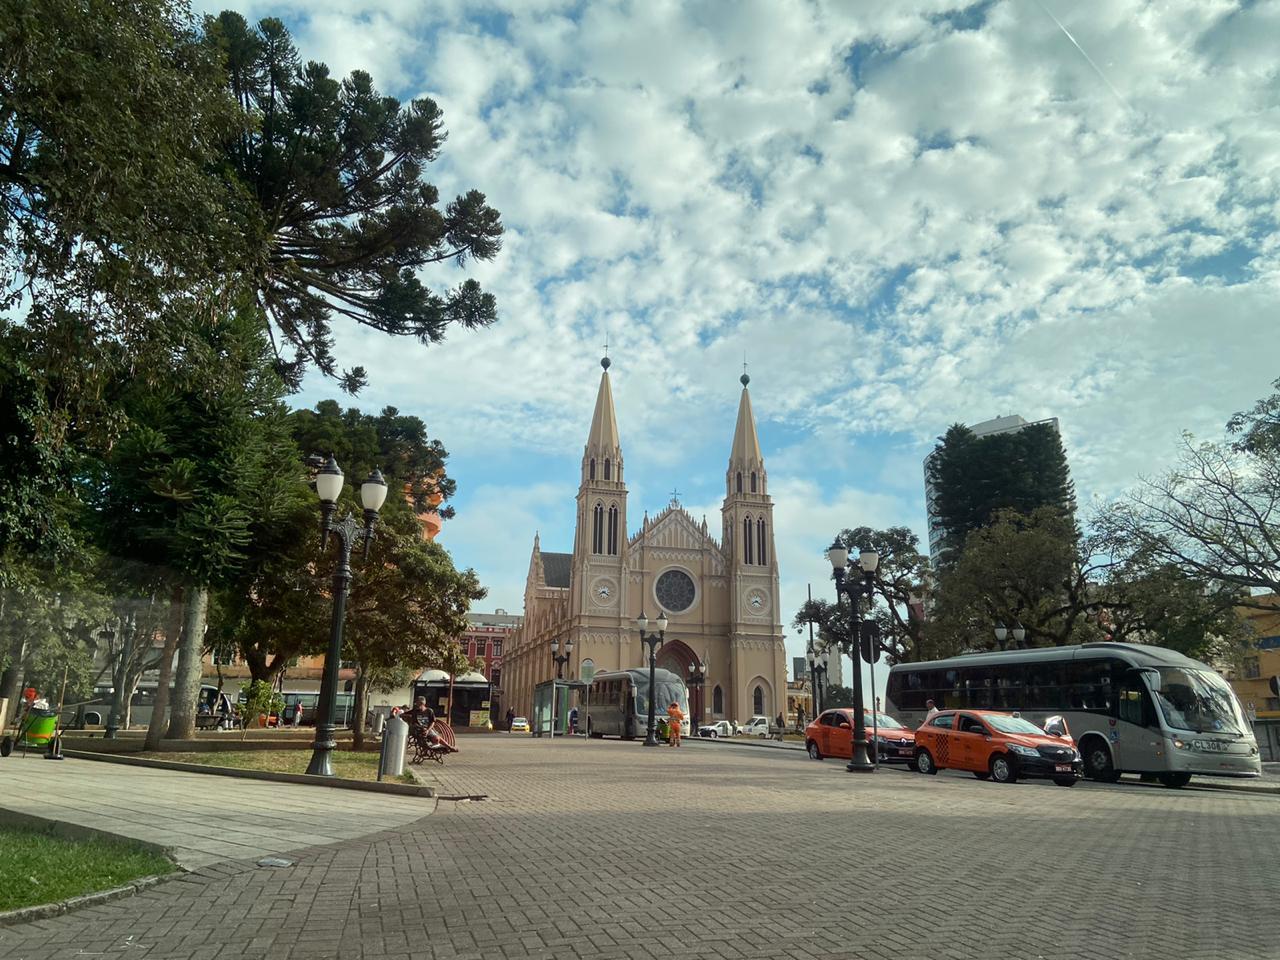 centro-praca-tiradentes-curitiba-igreja